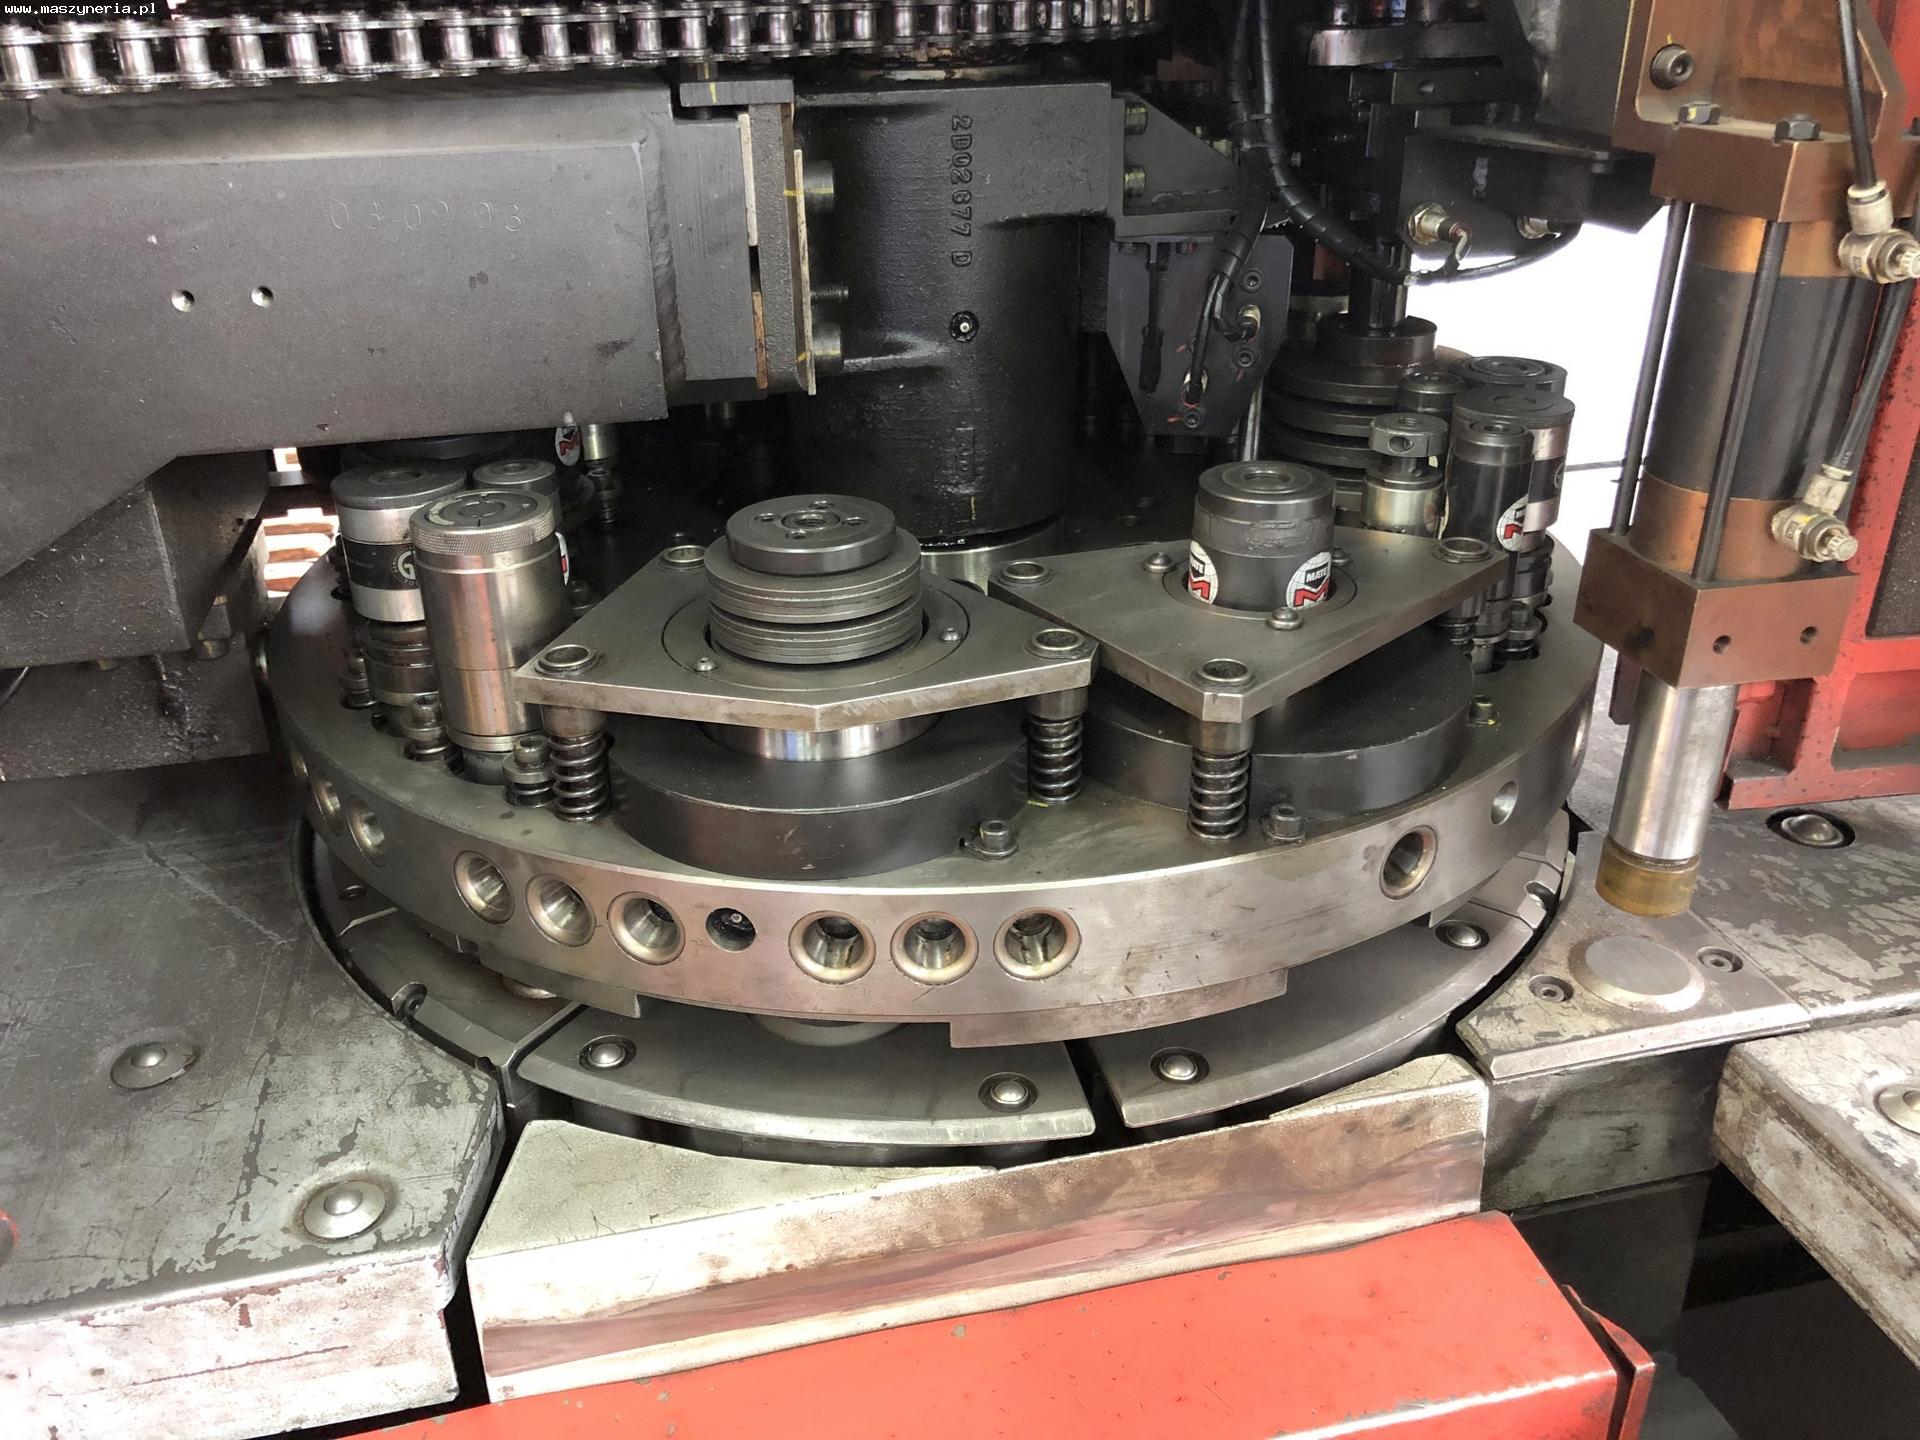 Punzonatrice a torretta AMADA EUROPE 258 in vendita - foto 3